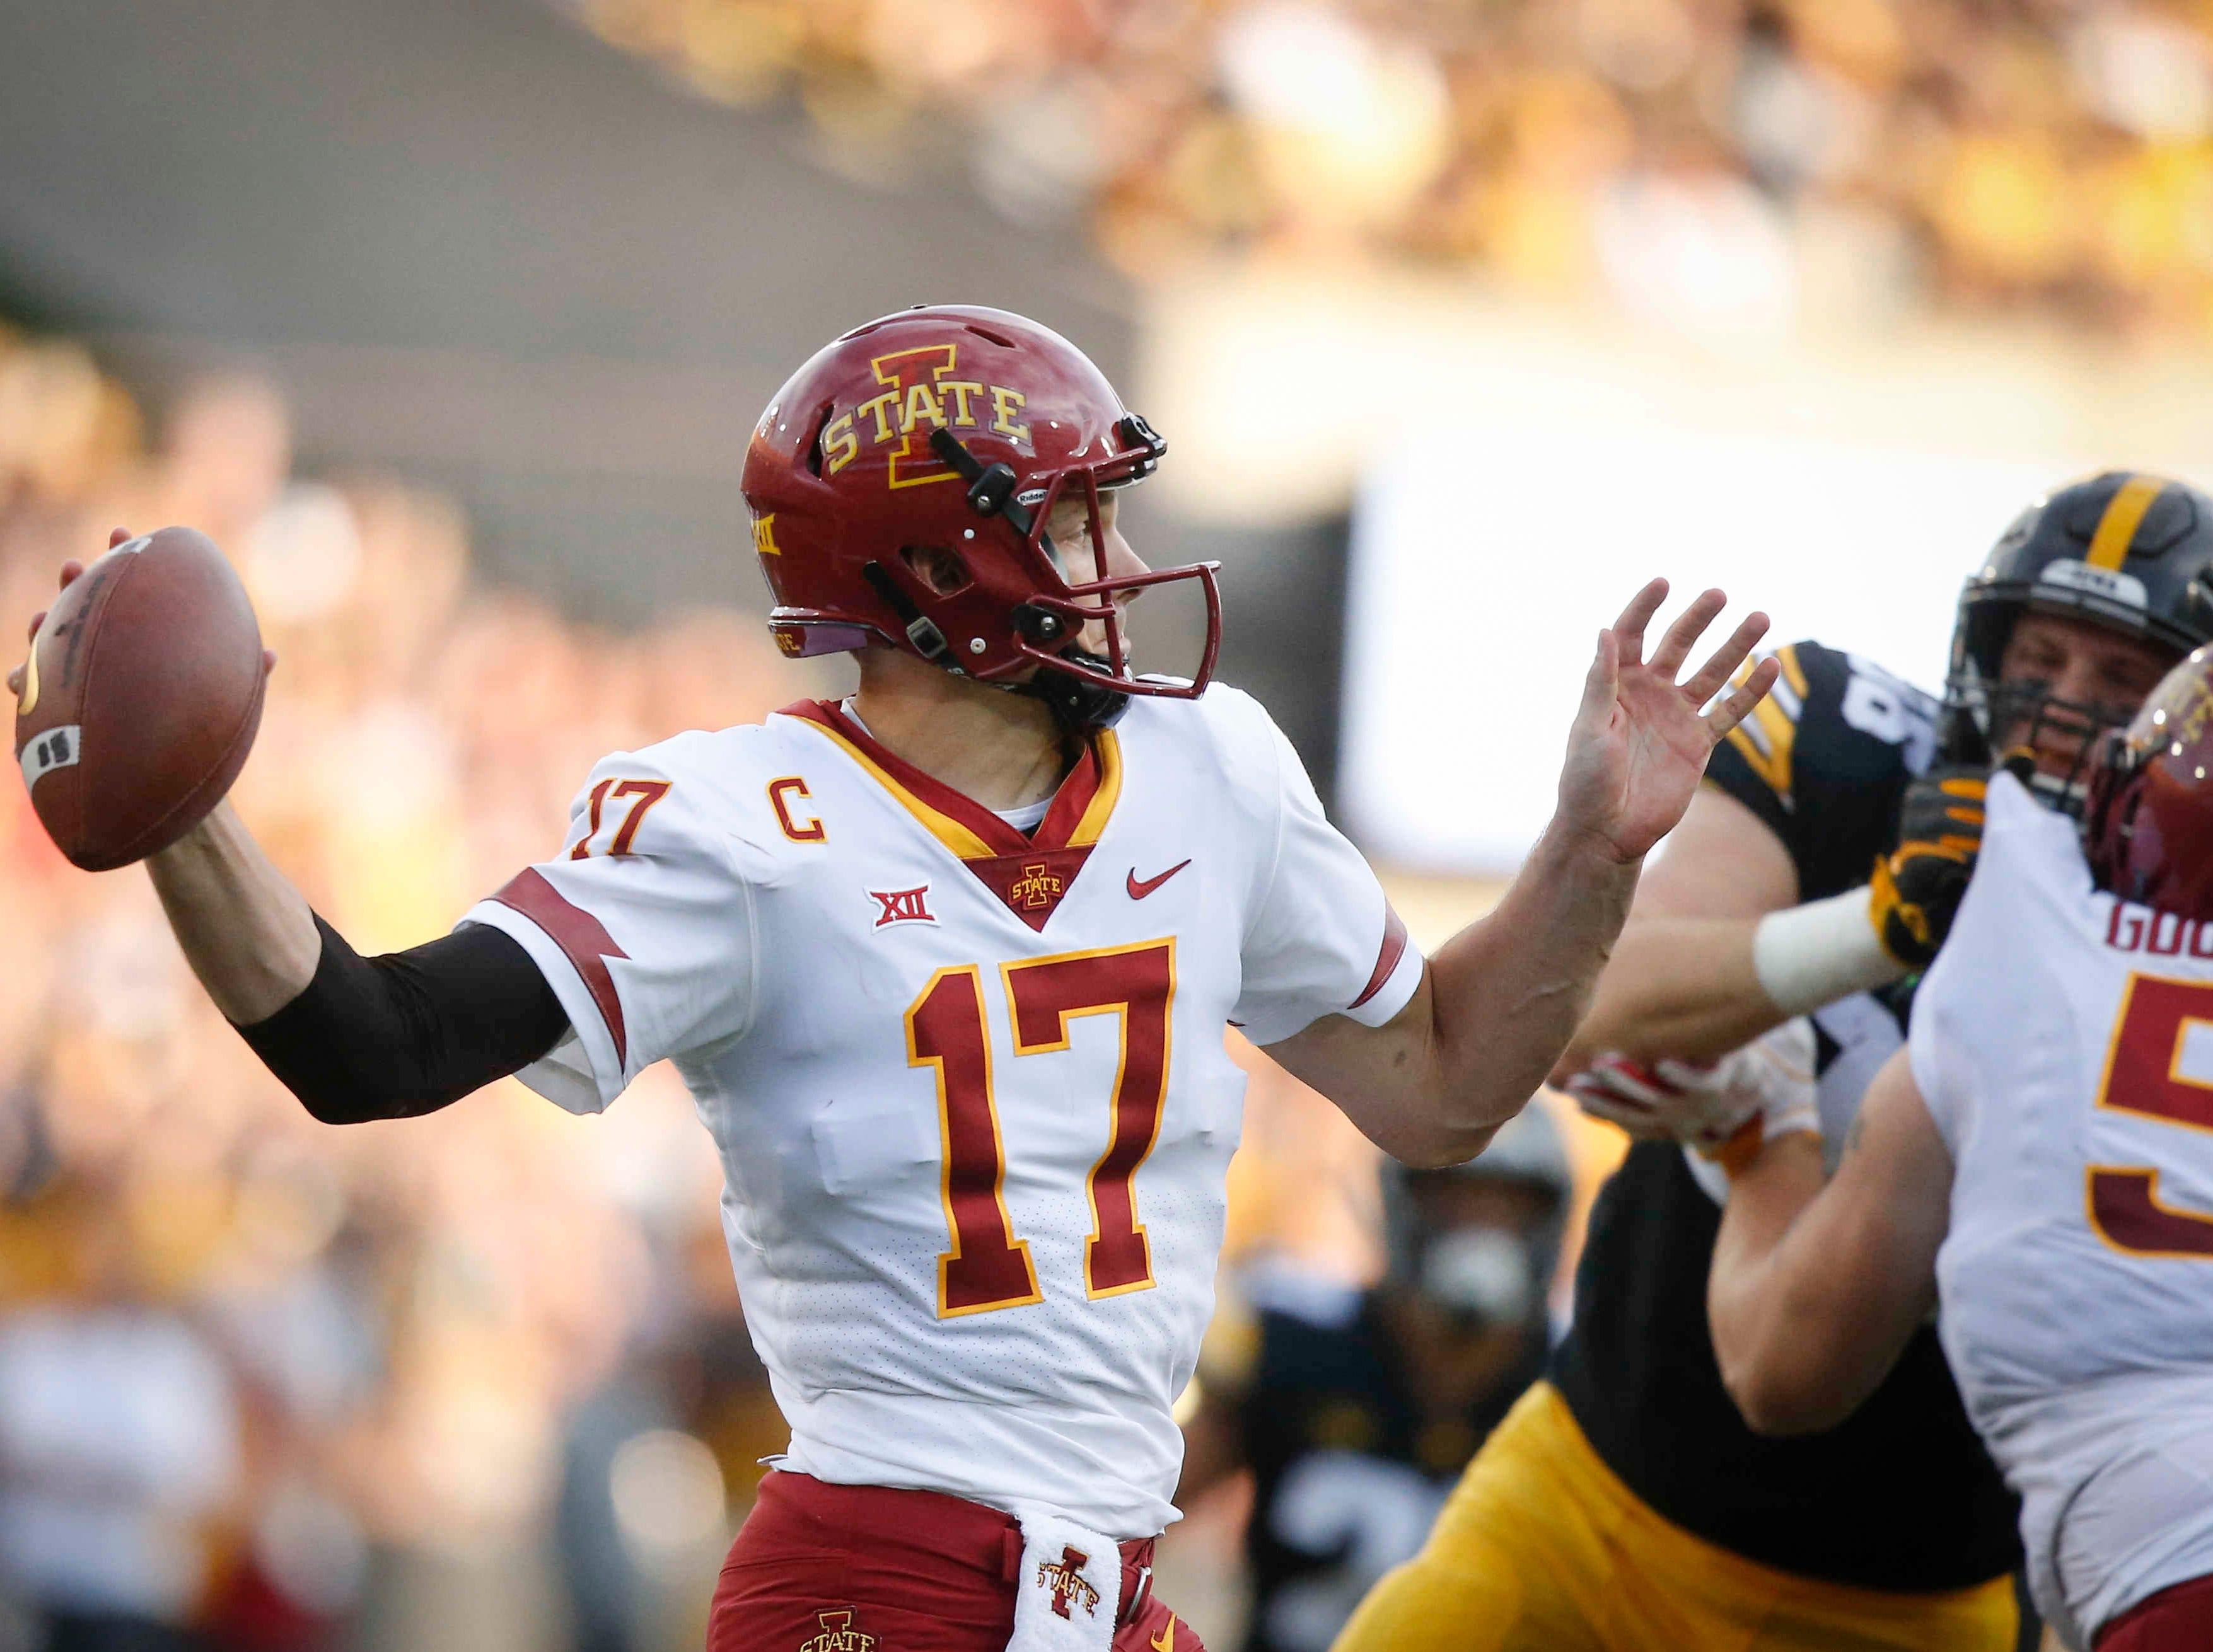 Iowa State quarterback Kyle Kempt fires a throw against Iowa on Saturday, Sept. 8, 2018, at Kinnick Stadium in Iowa City.